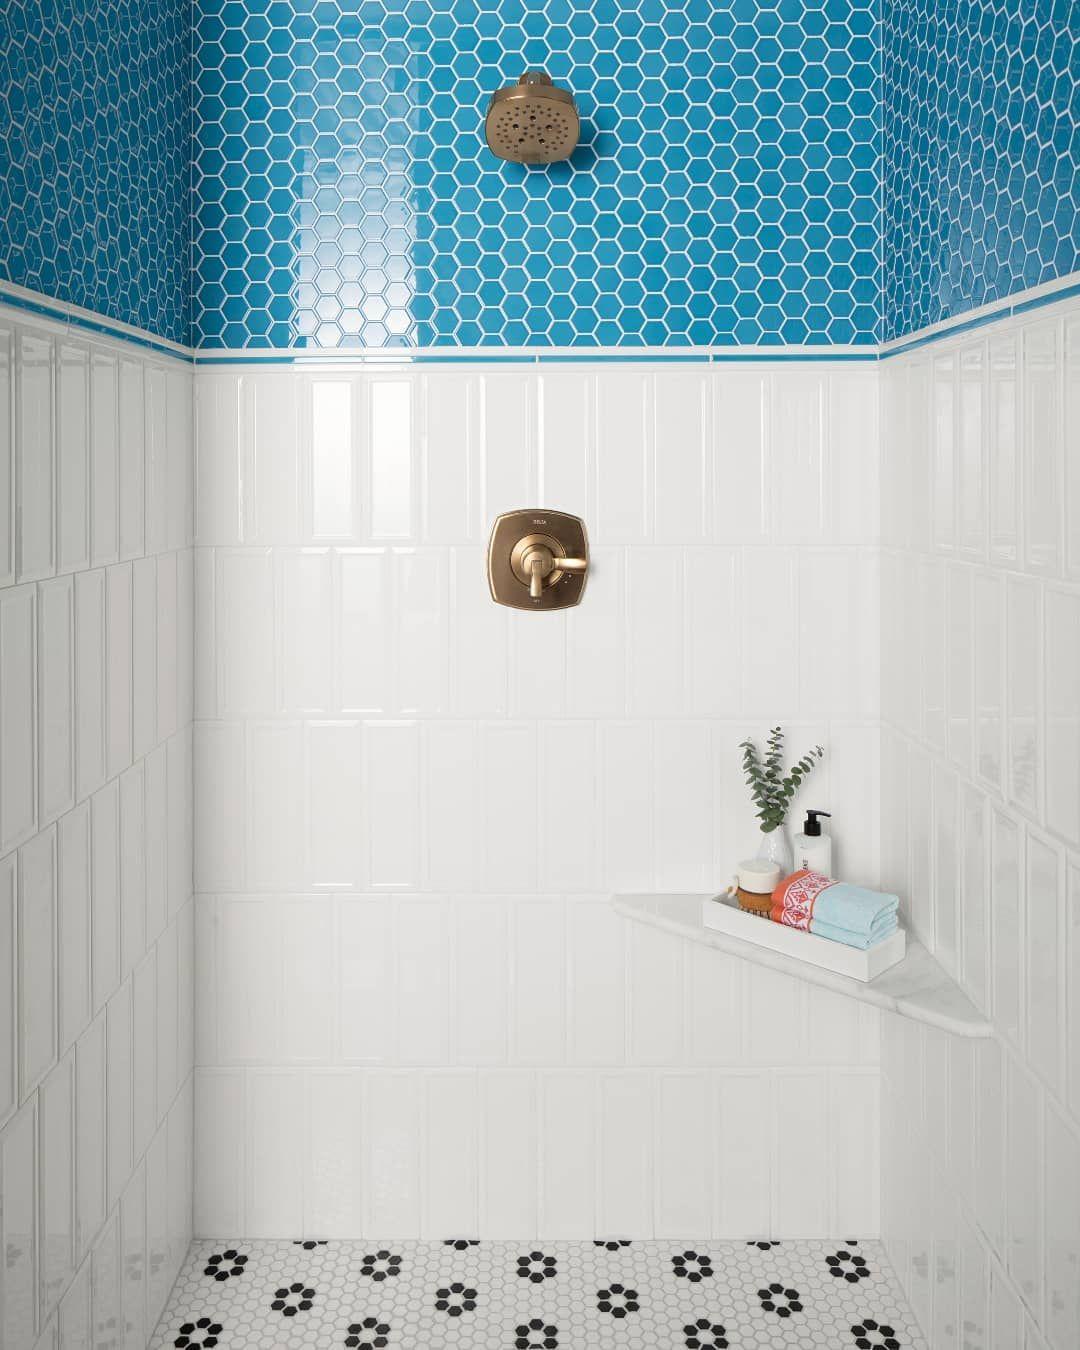 Something Bright Blue Shiny And New Bathroom Wall Tile Design Bathroom Decor Colors Latest Bathroom Tiles Design